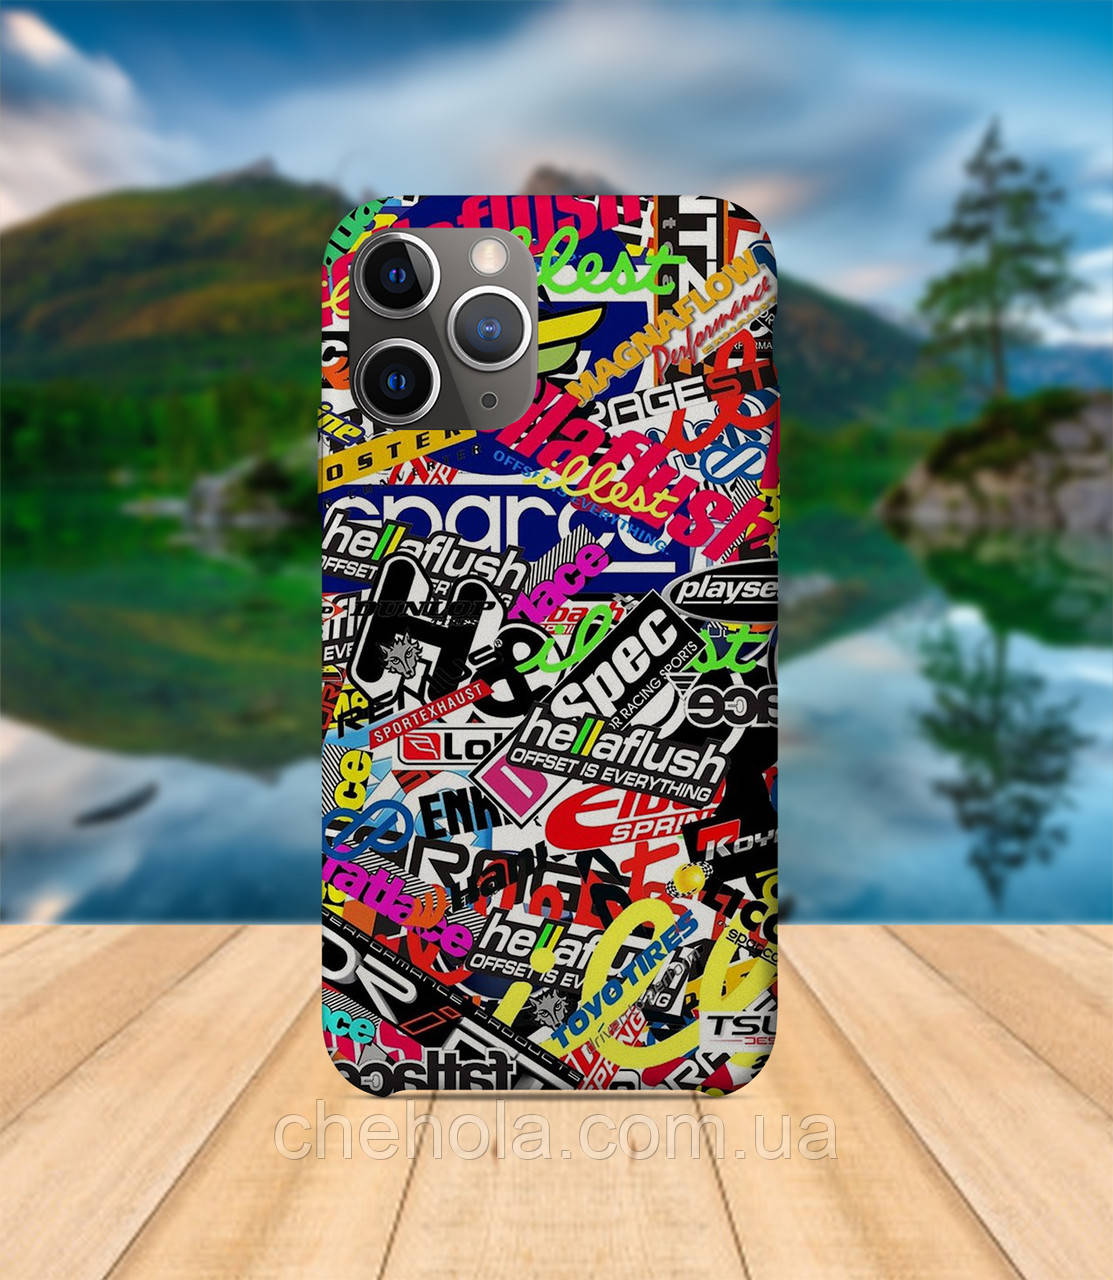 Чехол iPhone 11 PRO MAX Тюнинг авто с принтом